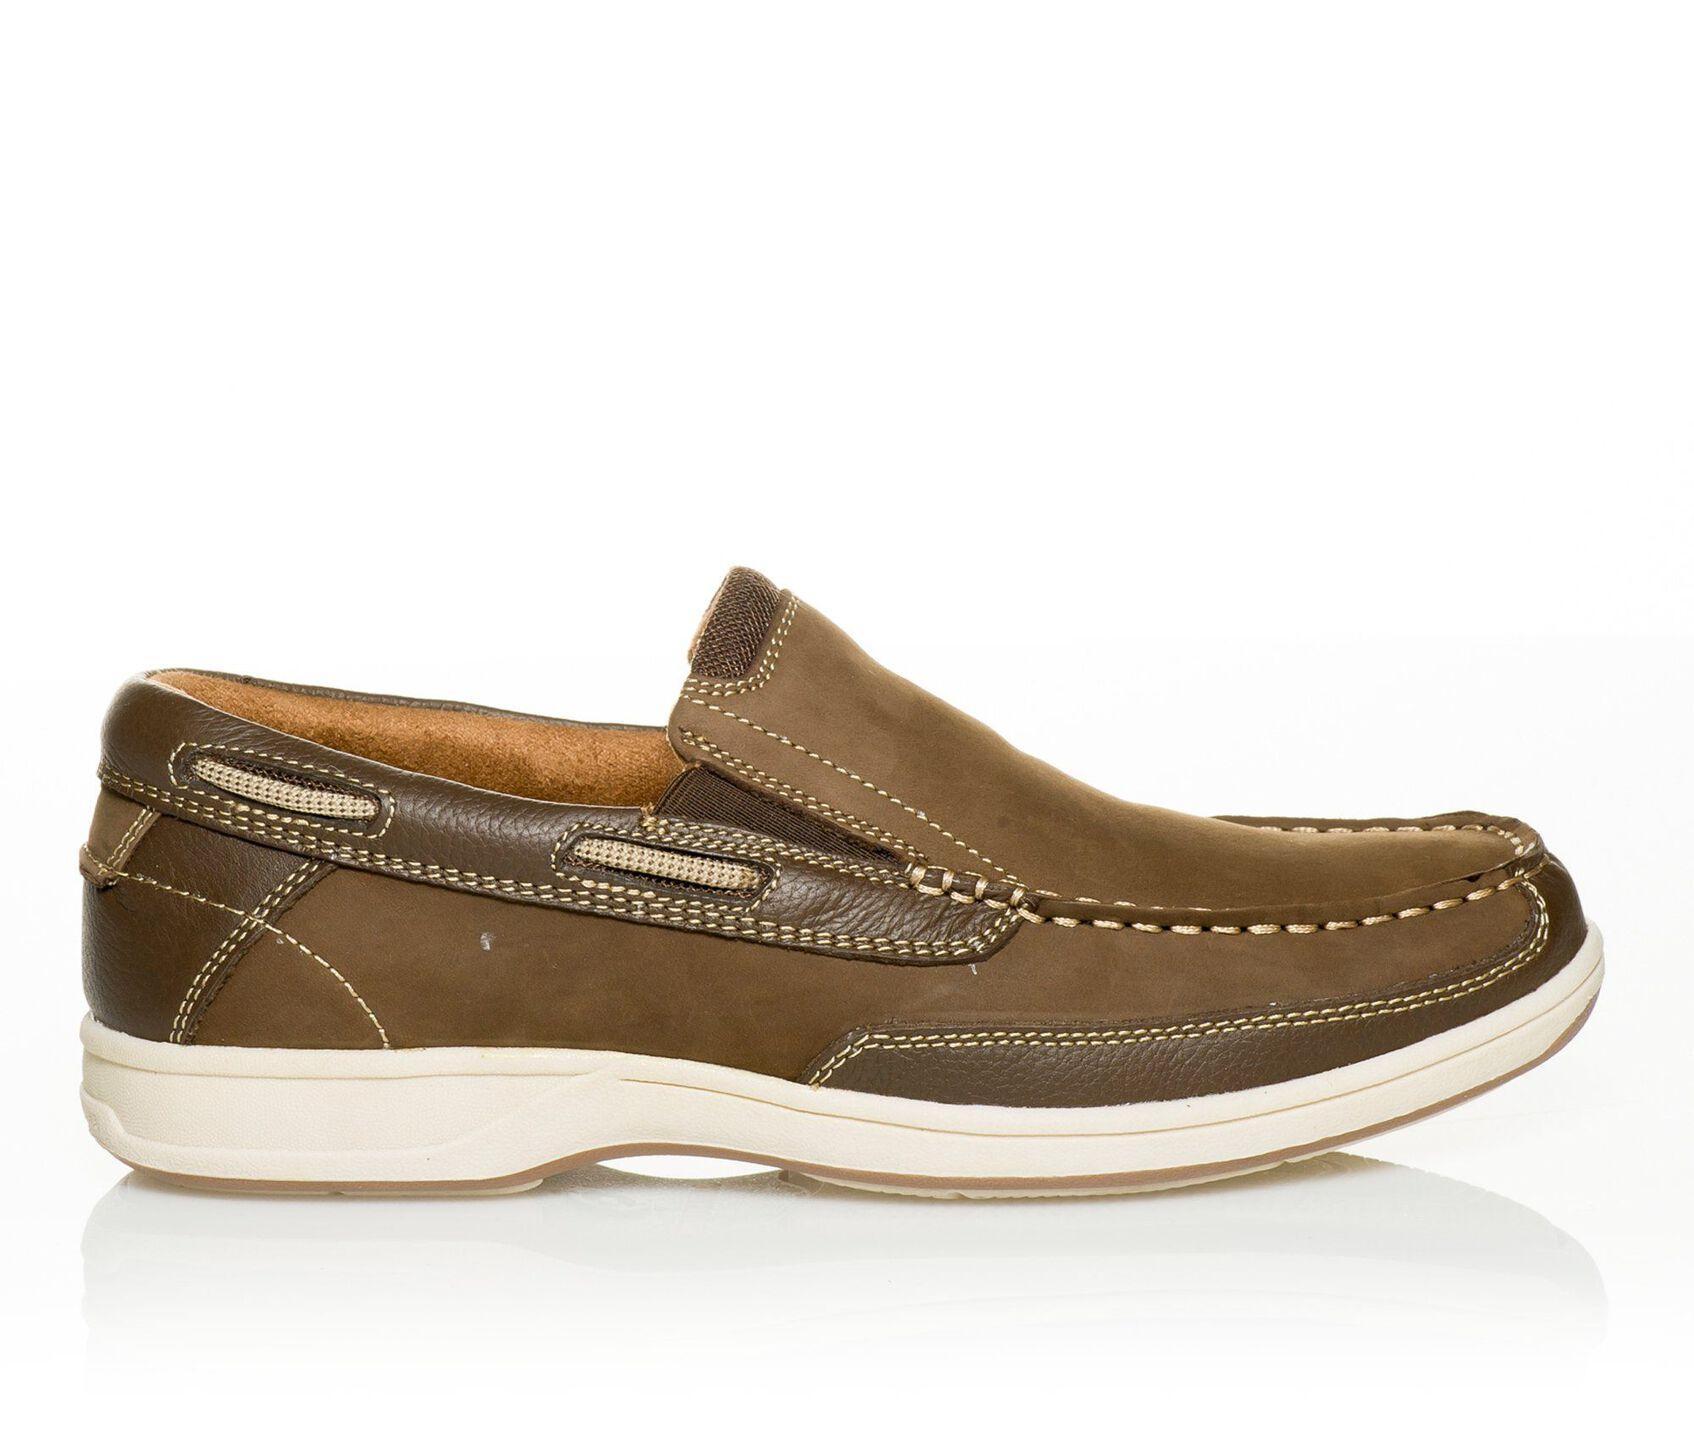 d35ce44715b8f Men's Florsheim Lakeside Slip Boat Shoes